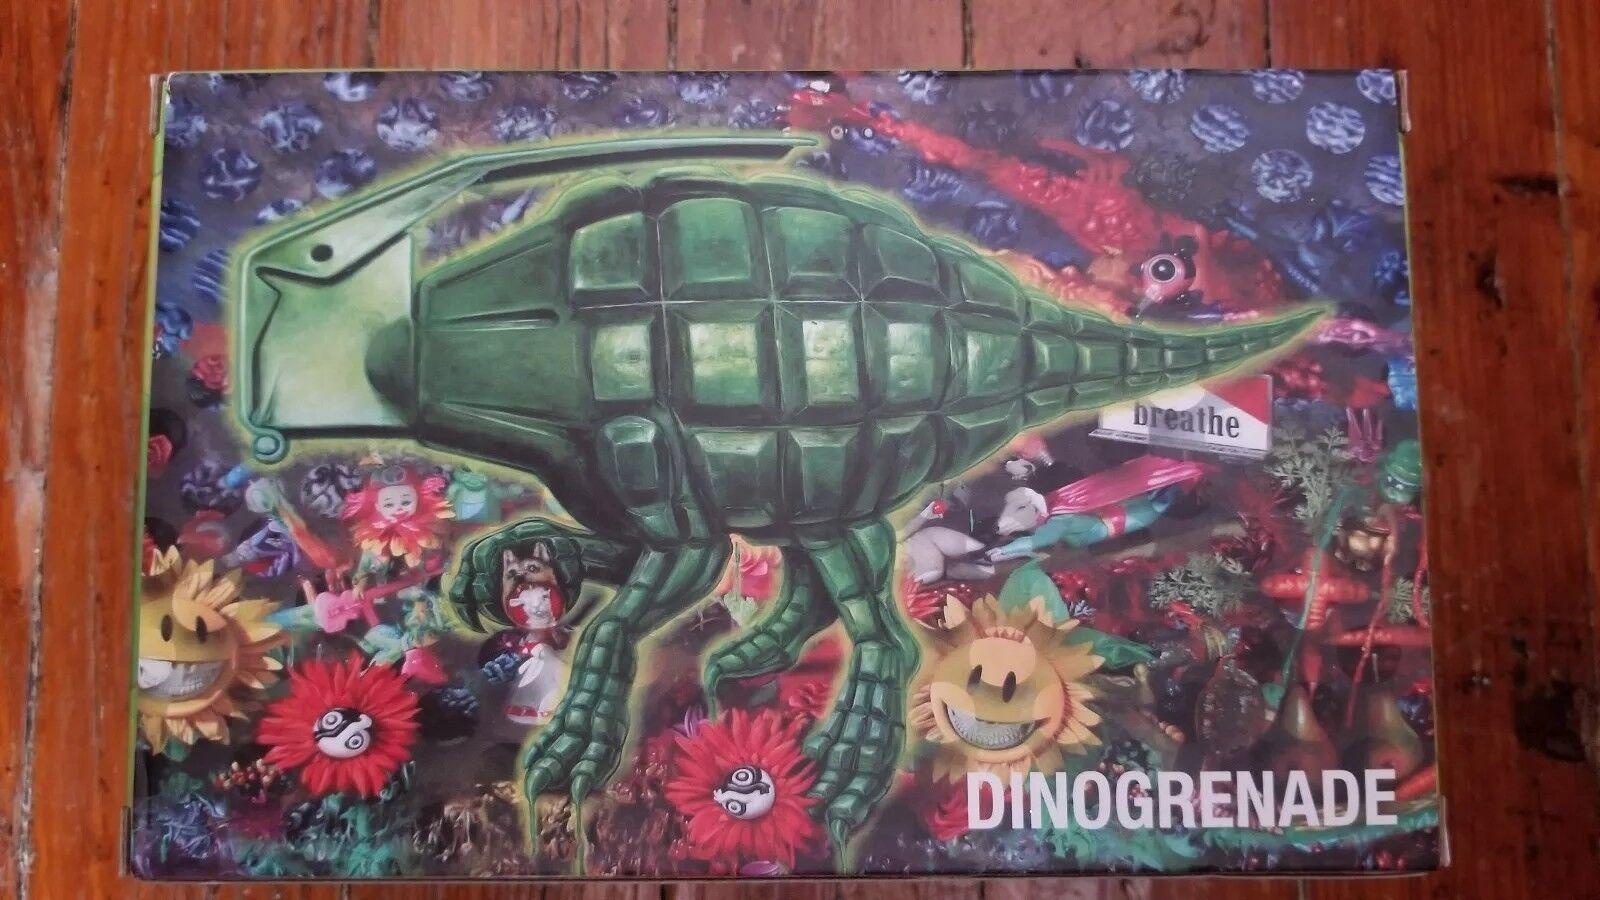 DINOGRENADE POPAGANDA designer RON ENGLISH subversive VINYL toy figure NIB